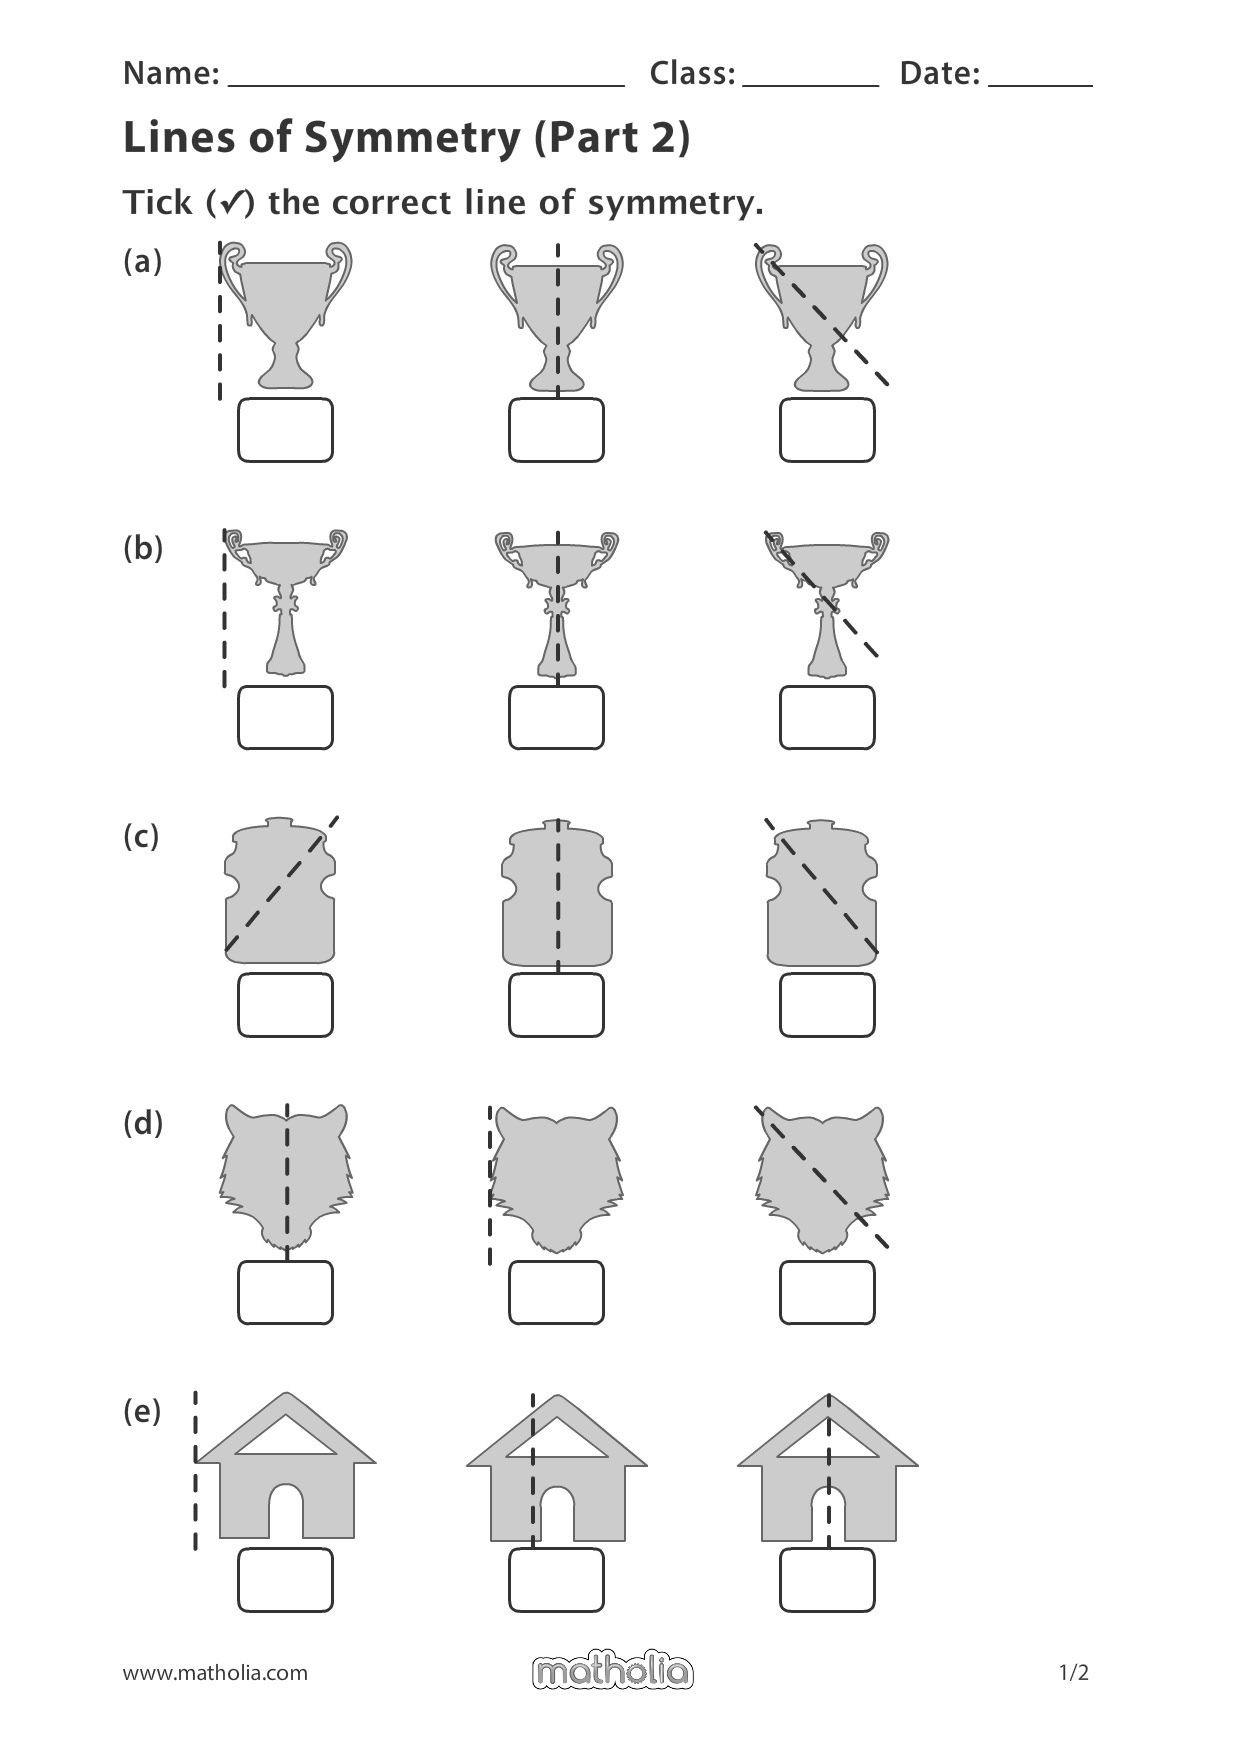 Line Of Symmetry Worksheet Pin On Matholia Printables – Grade 4